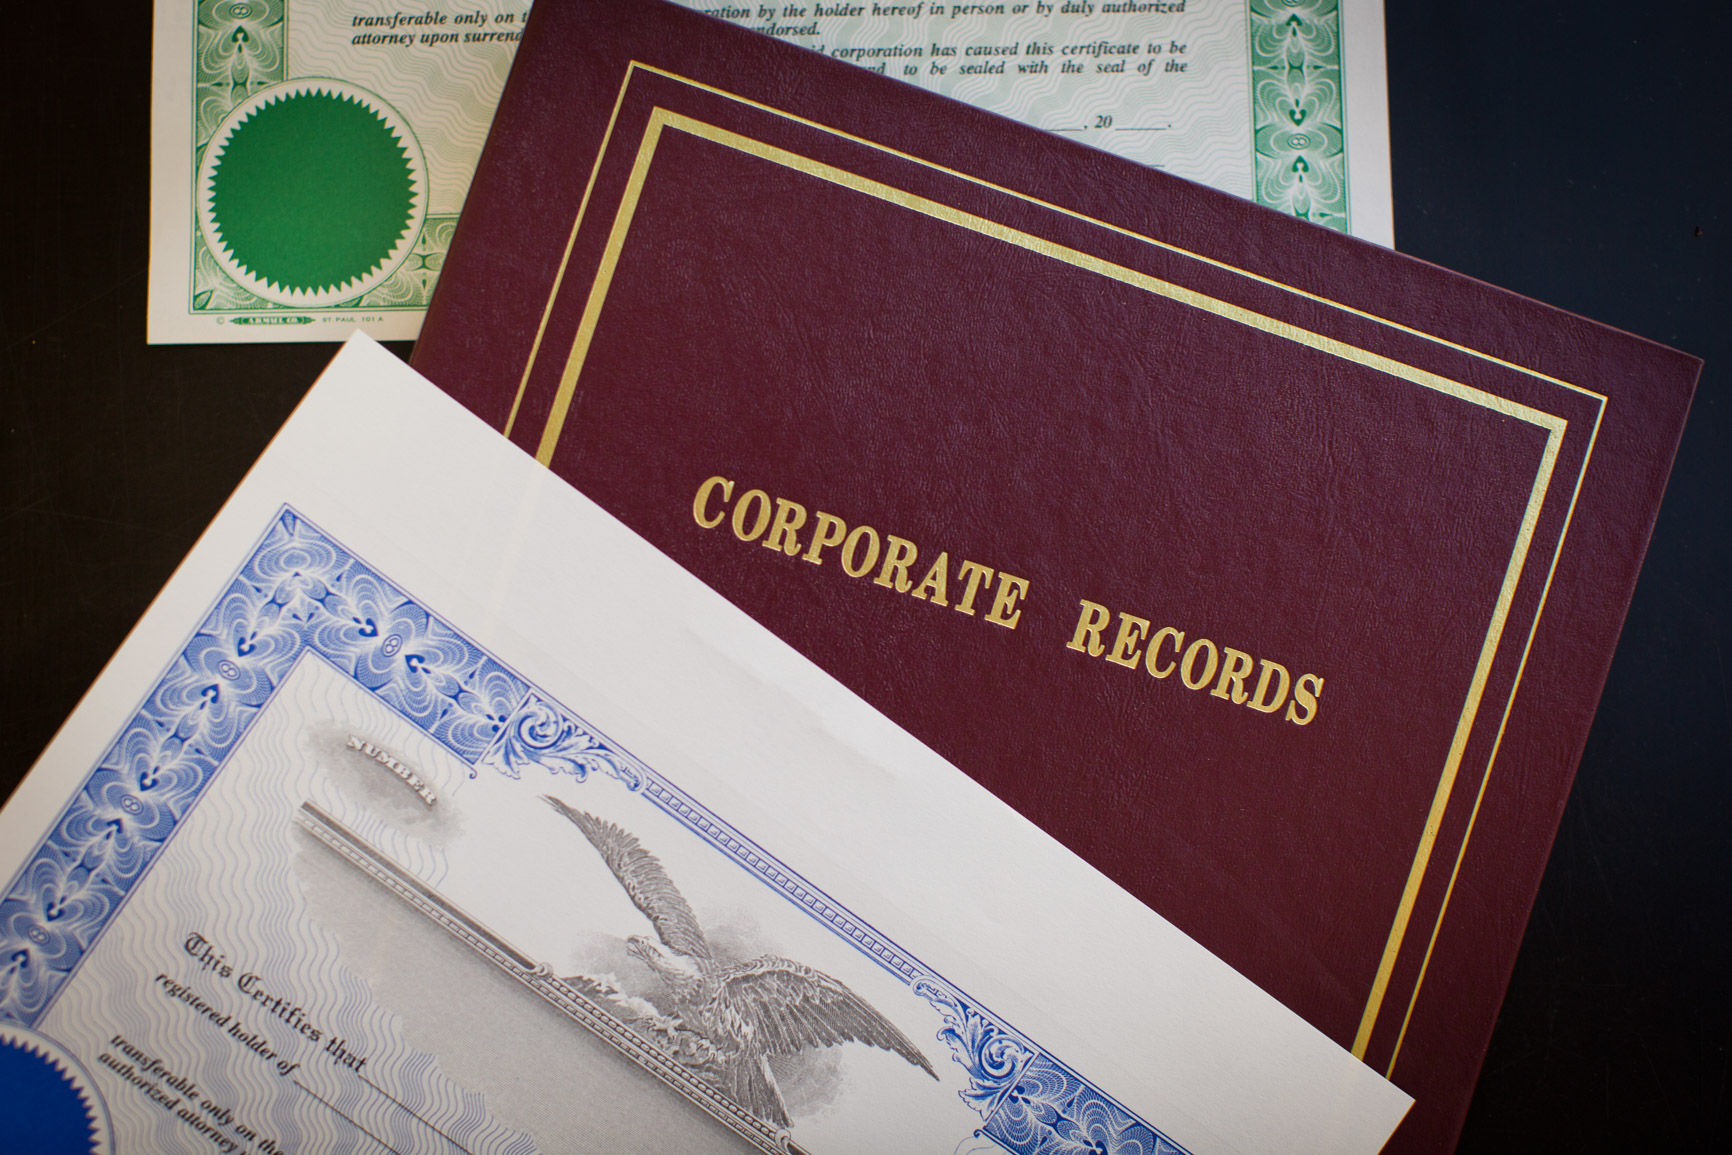 Minnesota Business Law Law Office